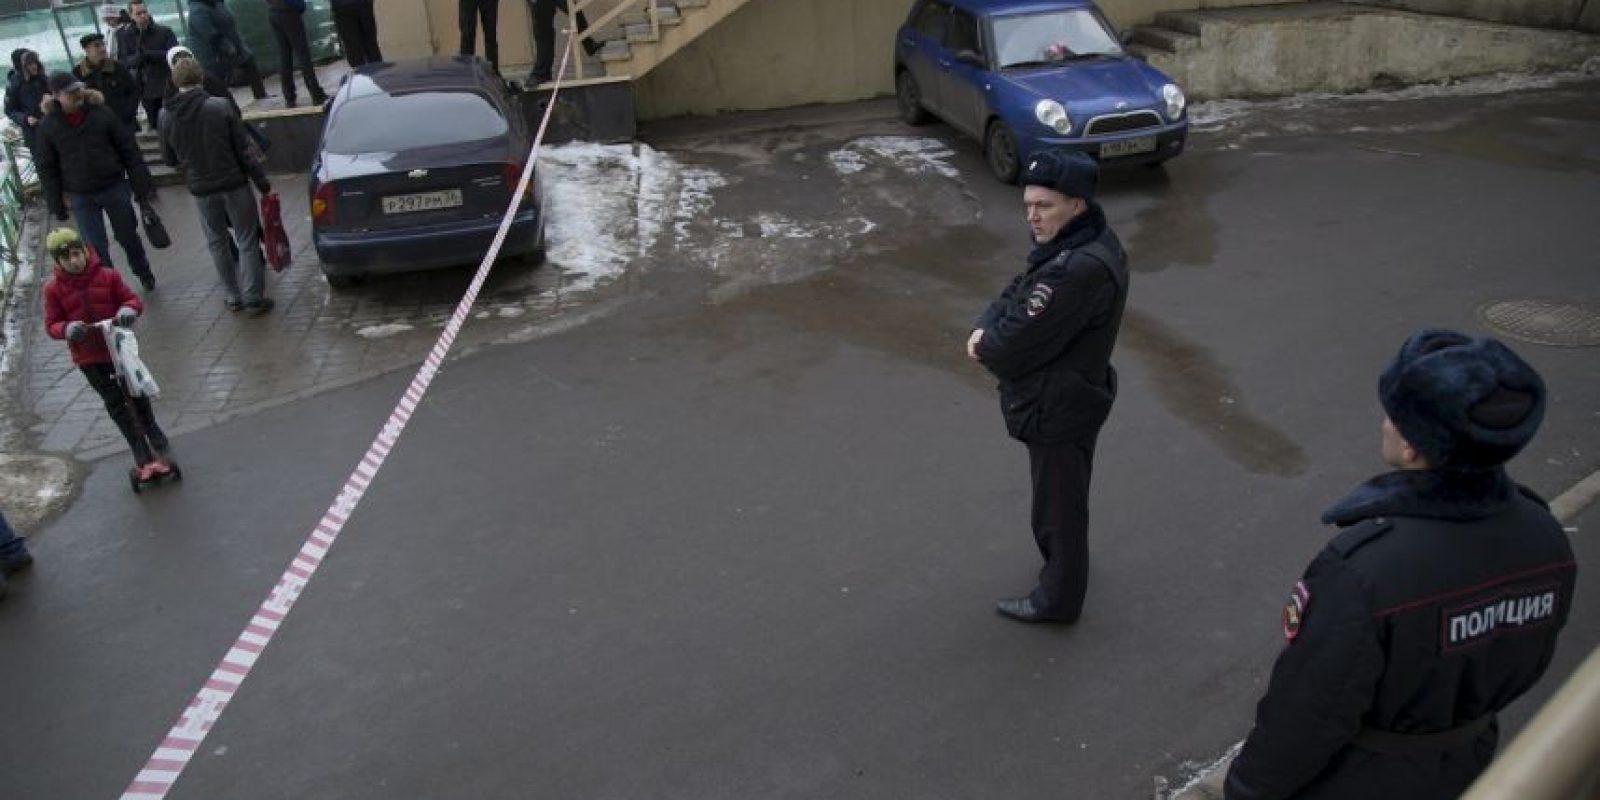 La mujer gritaba frases yihadistas Foto:AP